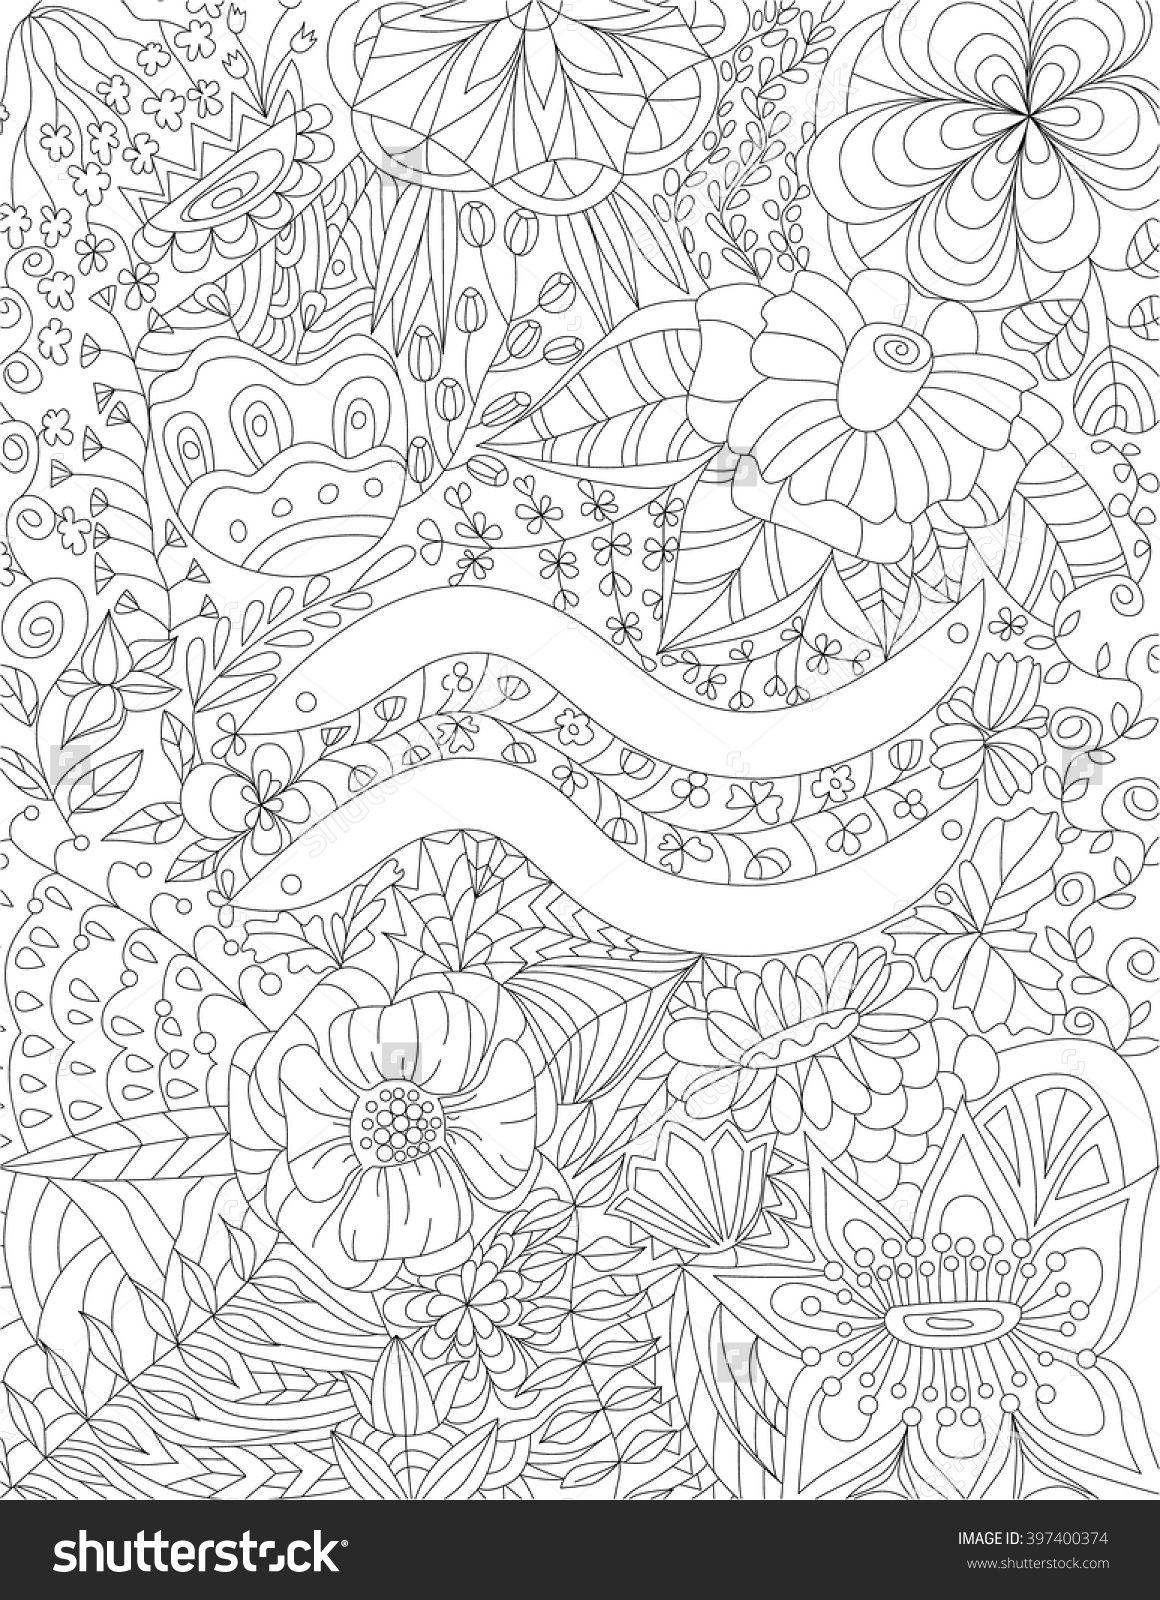 Zodiac sign aquarius floral geometric doodle pattern coloring page